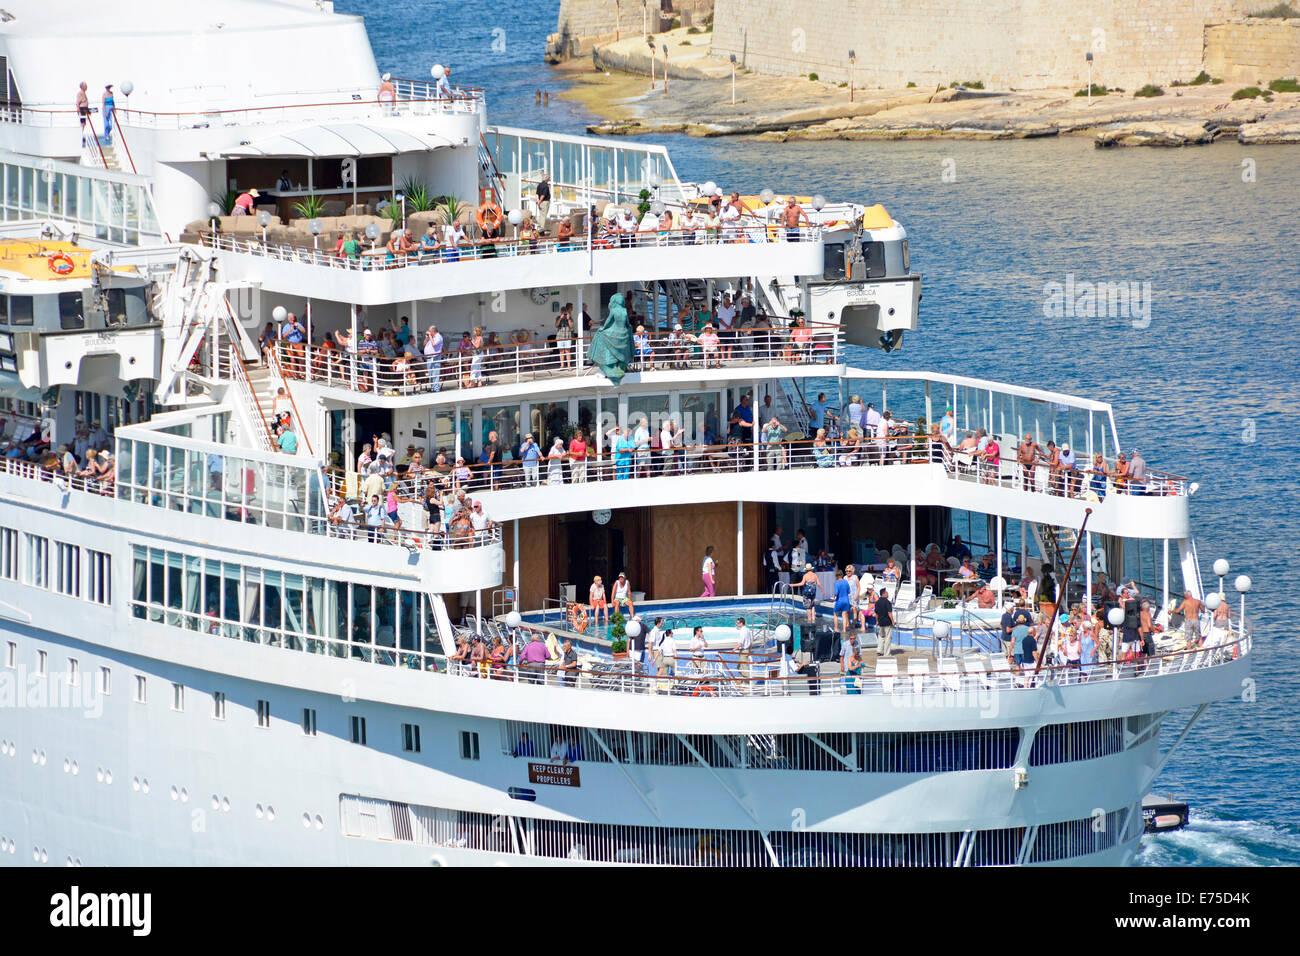 Passengers gathered on the stern decks of cruise ship Boudicca as she departs Grand Harbour Valletta Valeta Mediterranean - Stock Image